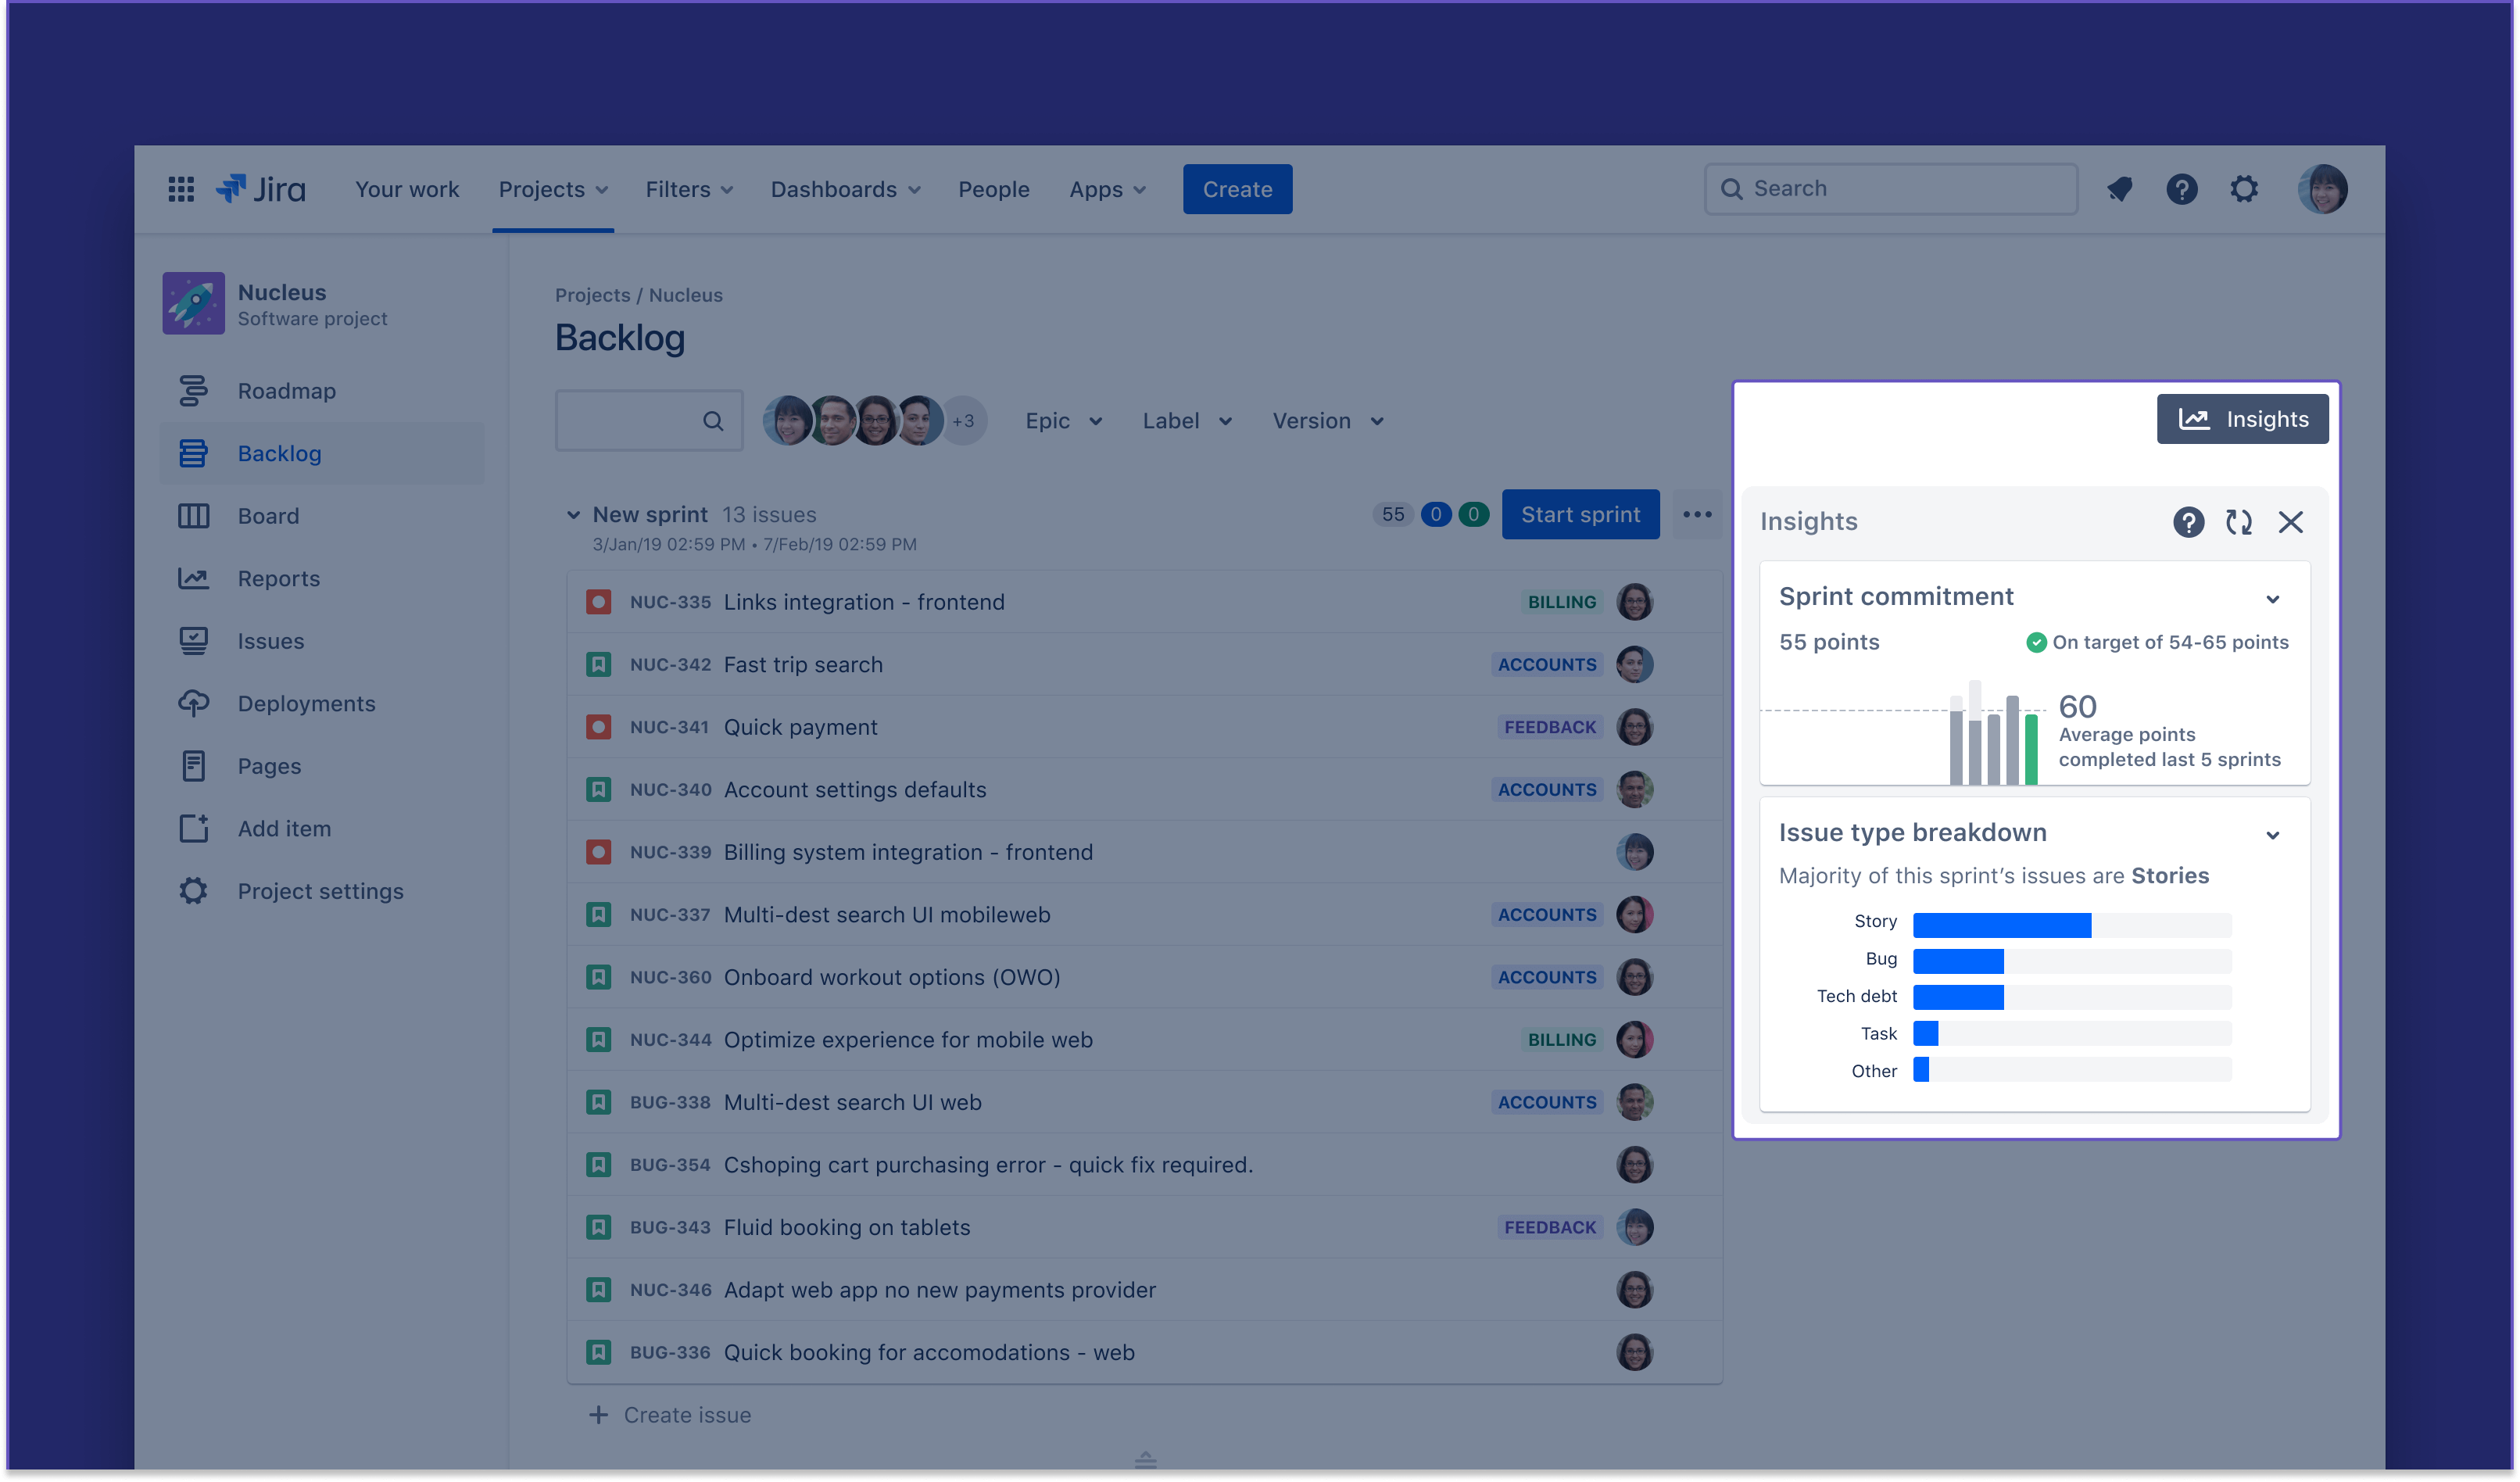 Backlog panel highlight